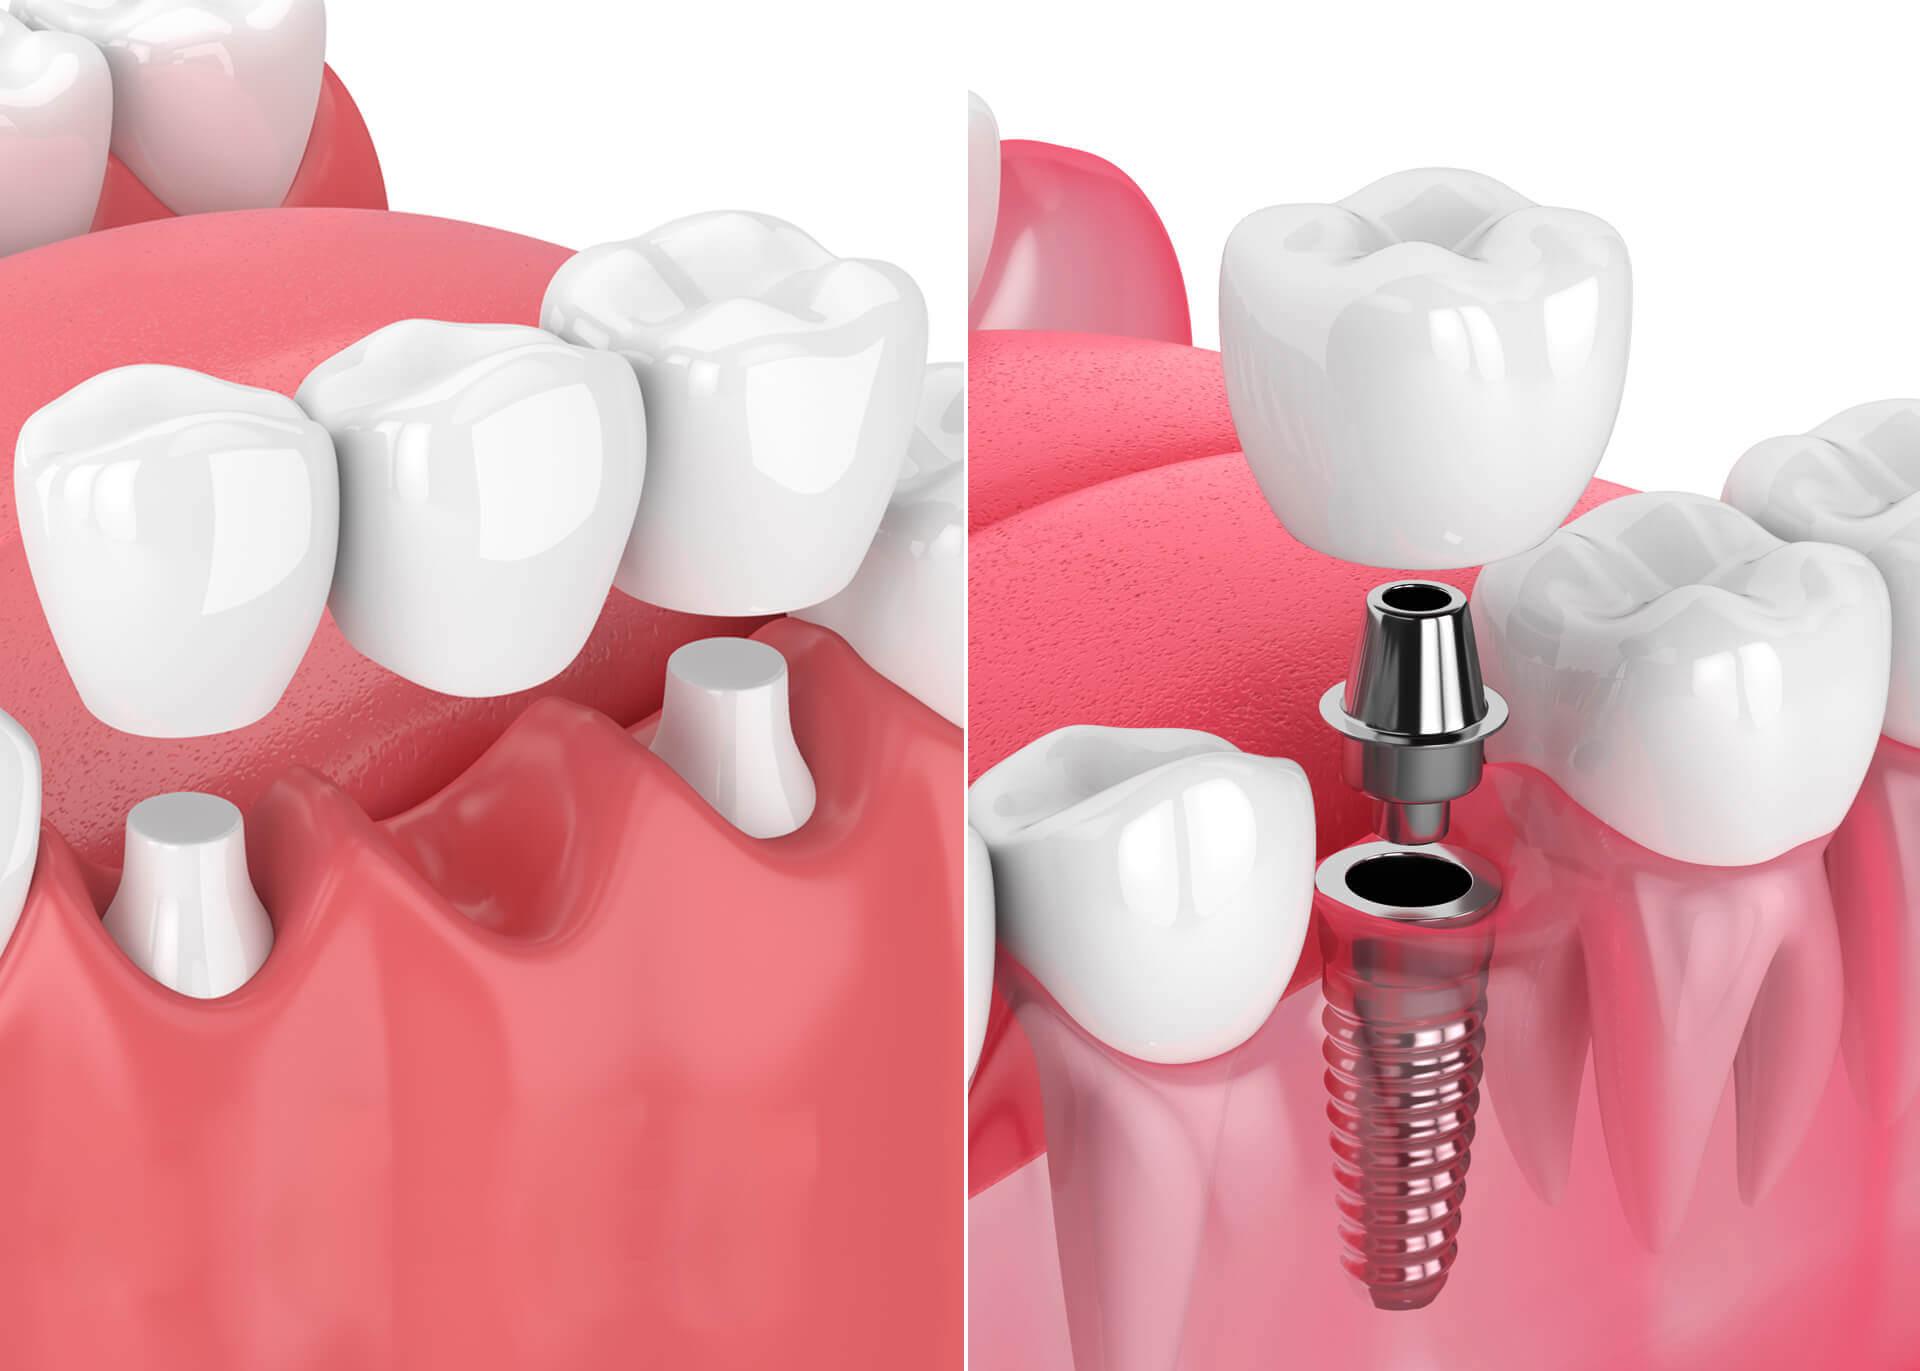 Chirurgie dentaire : une chirurgie merveilleuse ?